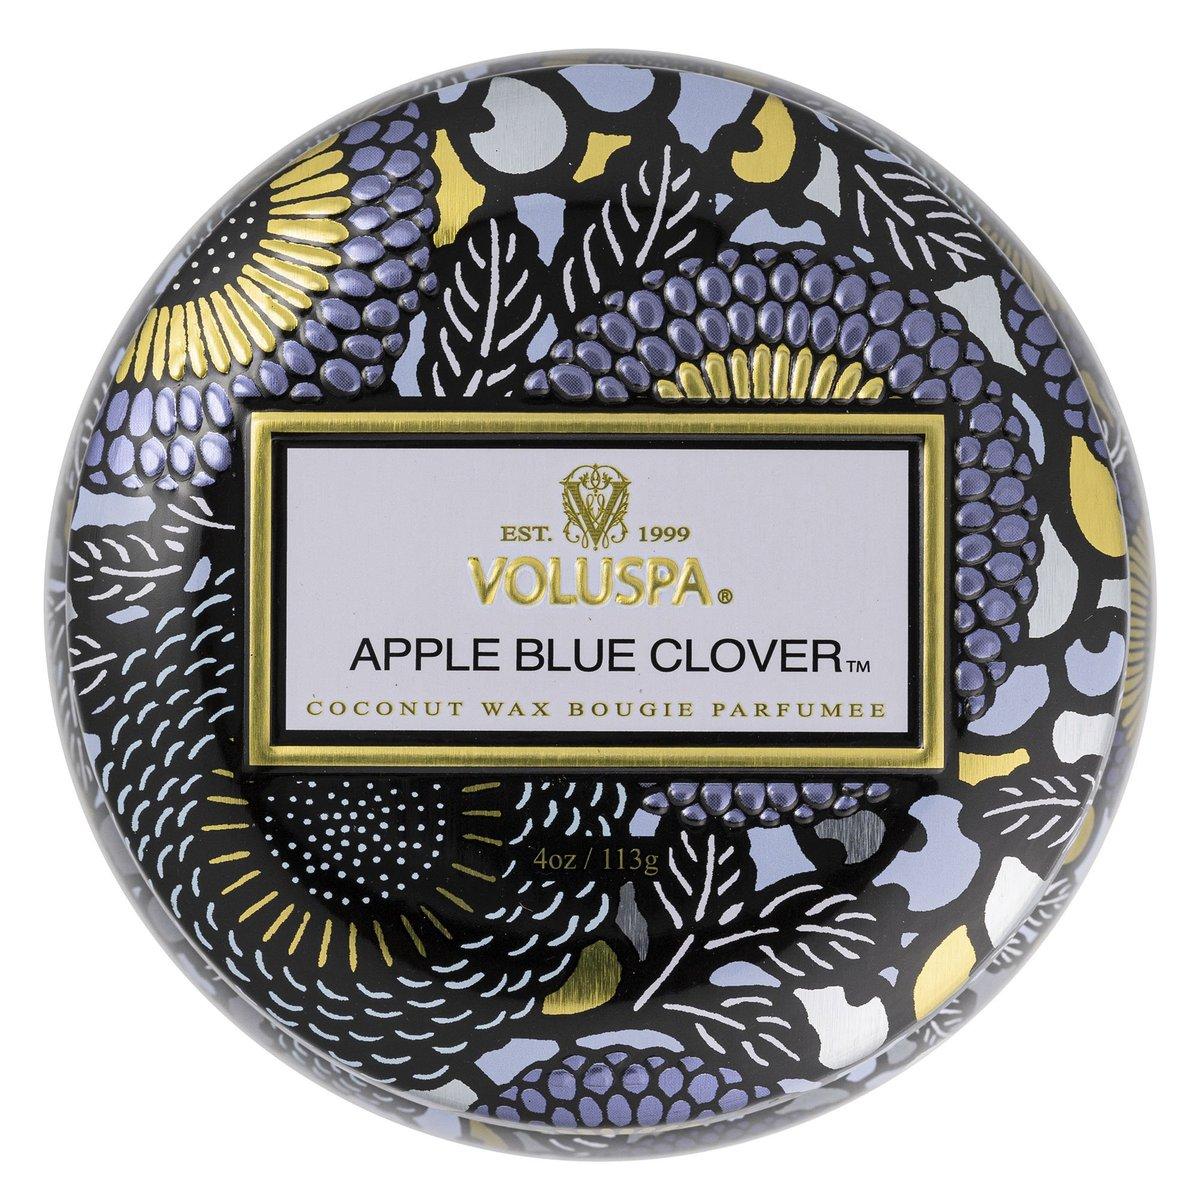 Vela Voluspa Lata Apple Blue Clover 25H